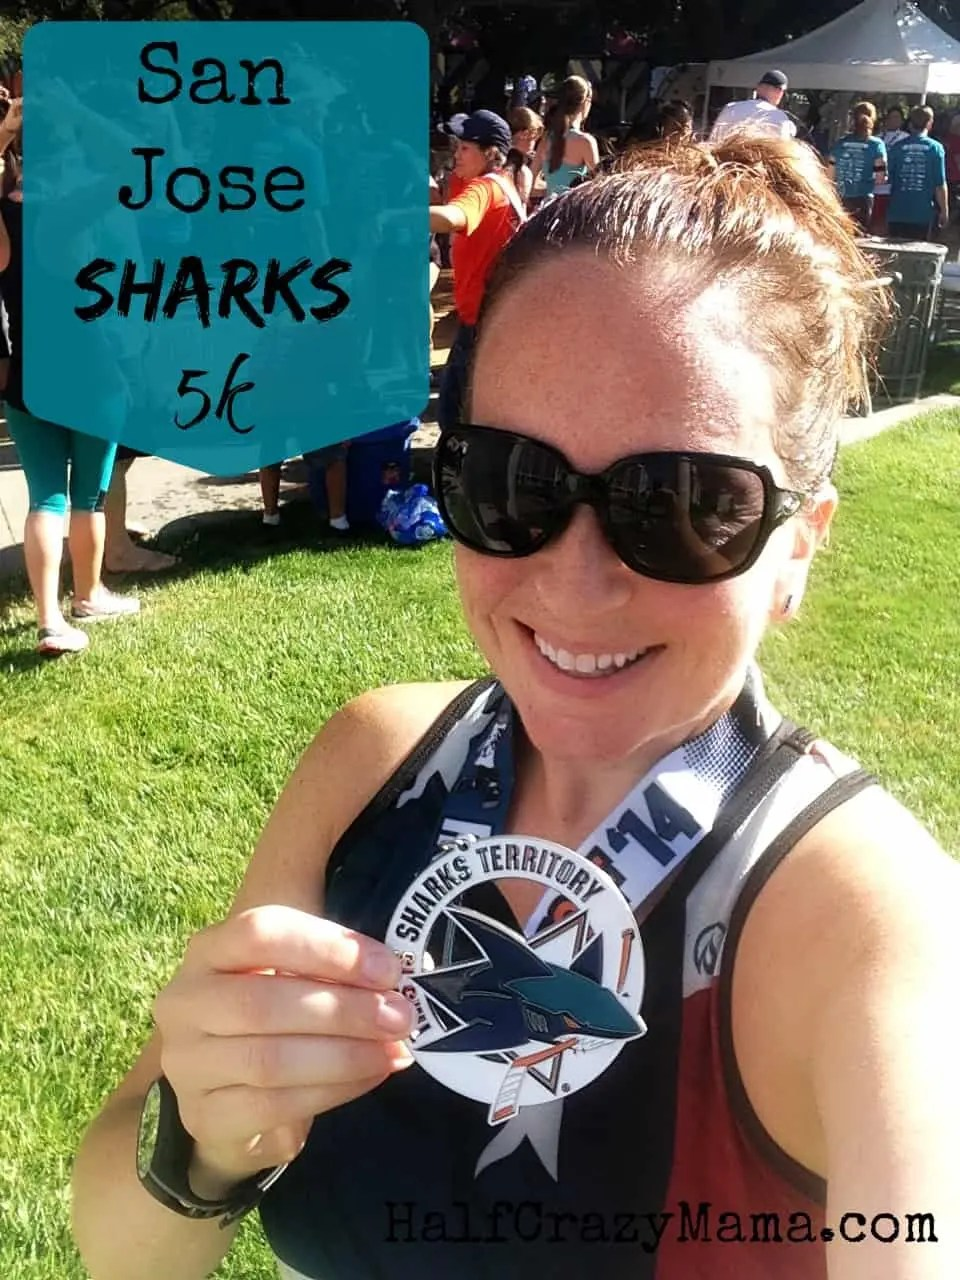 San Jose Sharks 5k titile